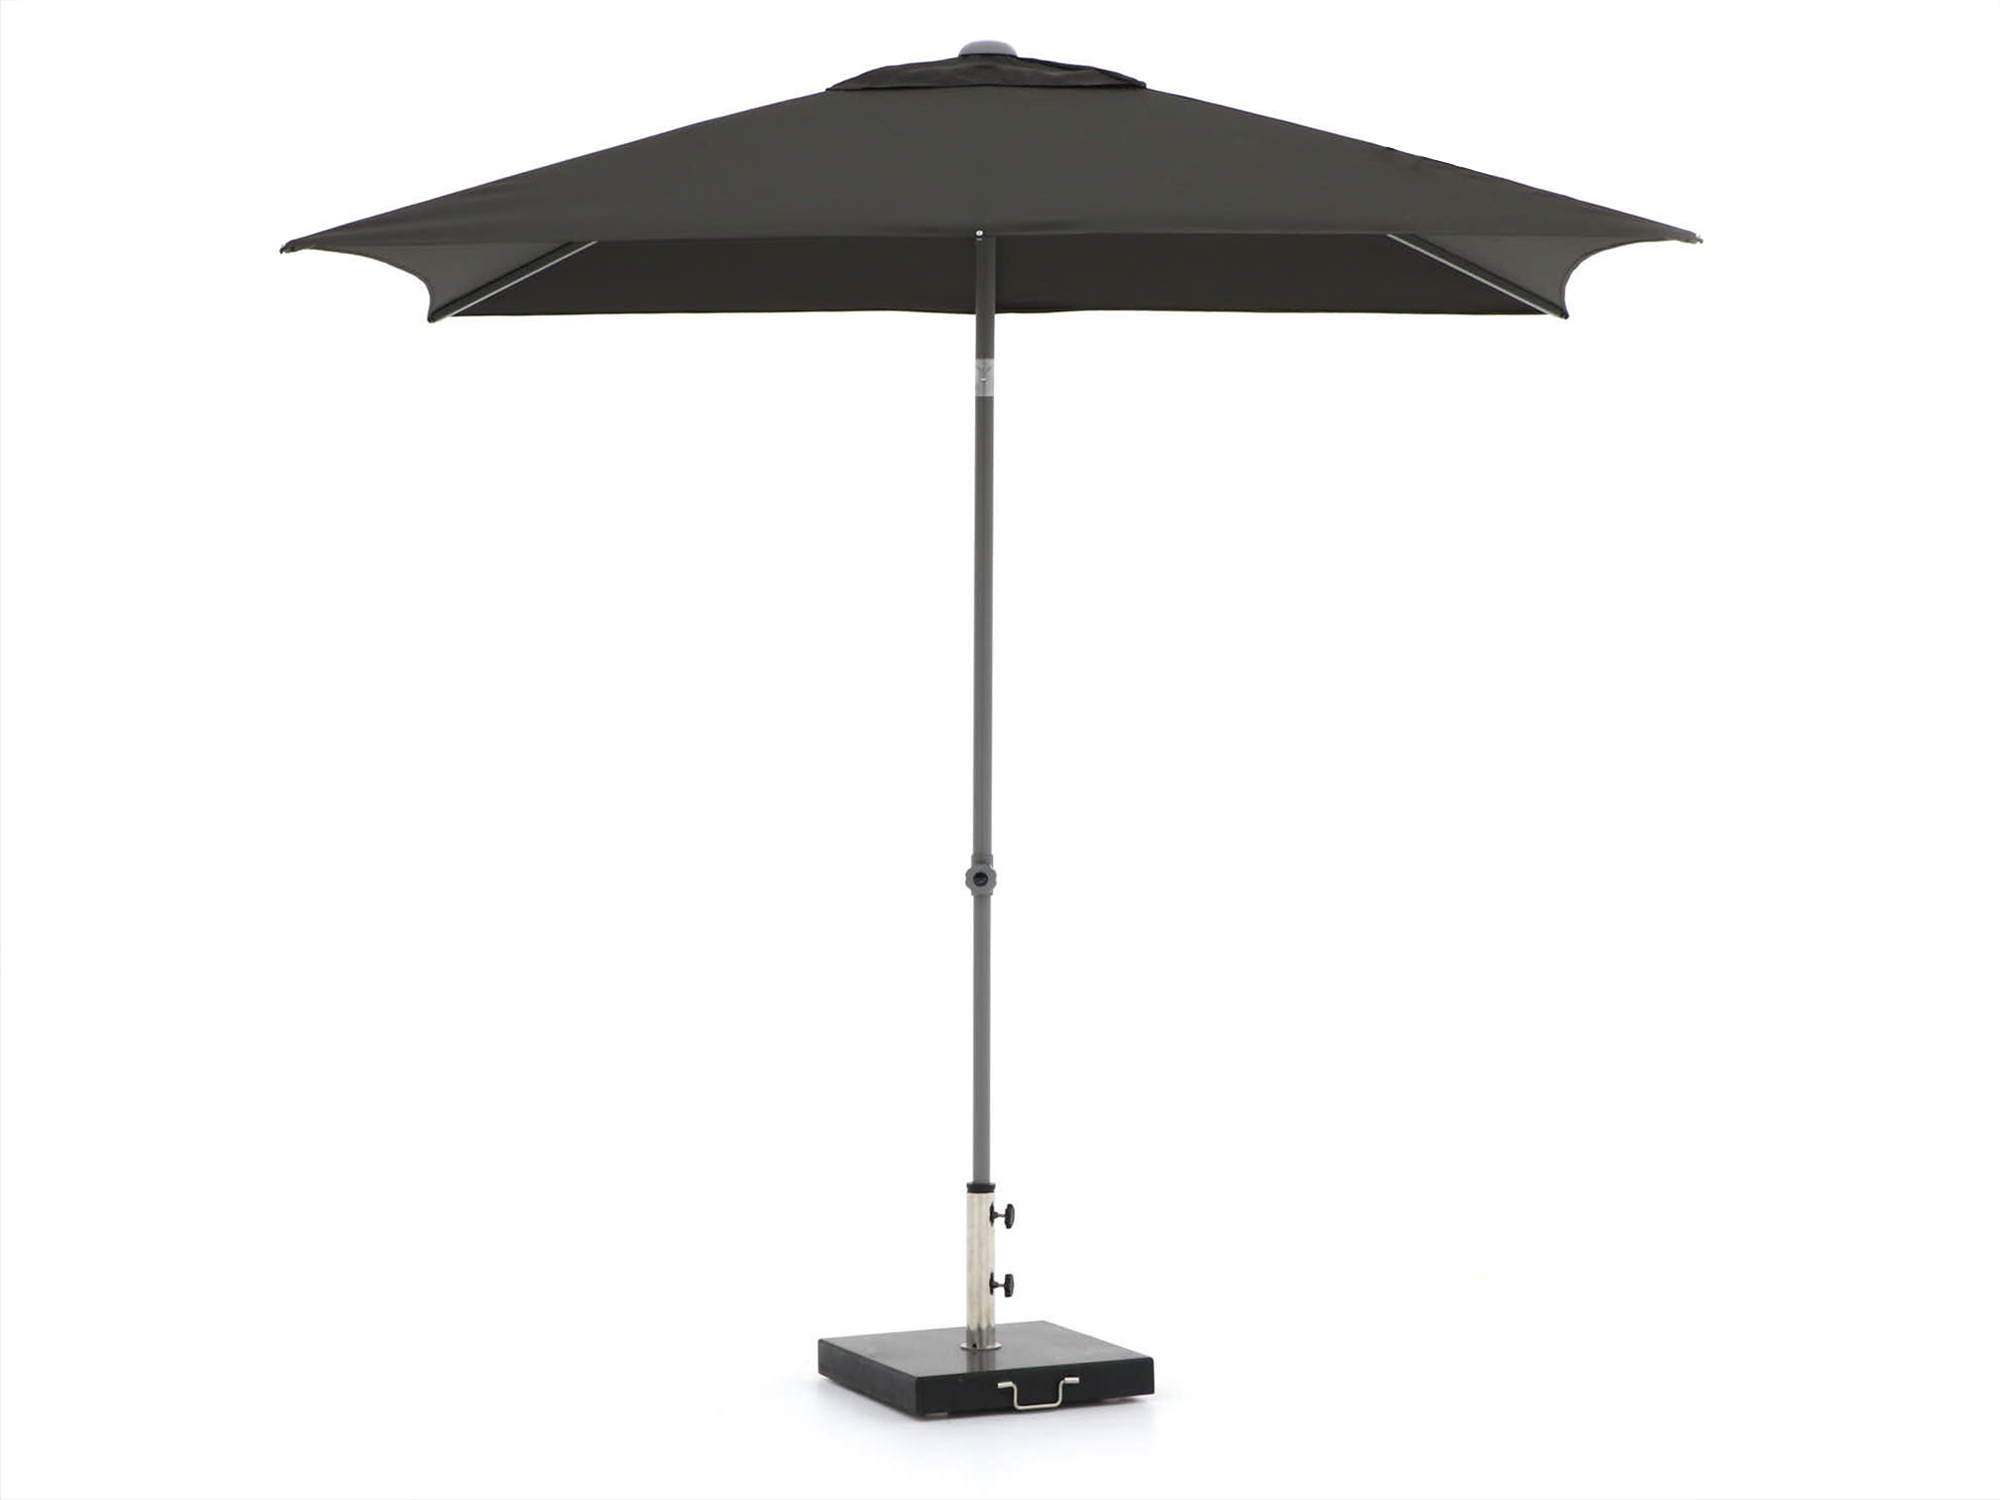 Shadowline Push-up parasol 250x200cm - Laagste prijsgarantie!